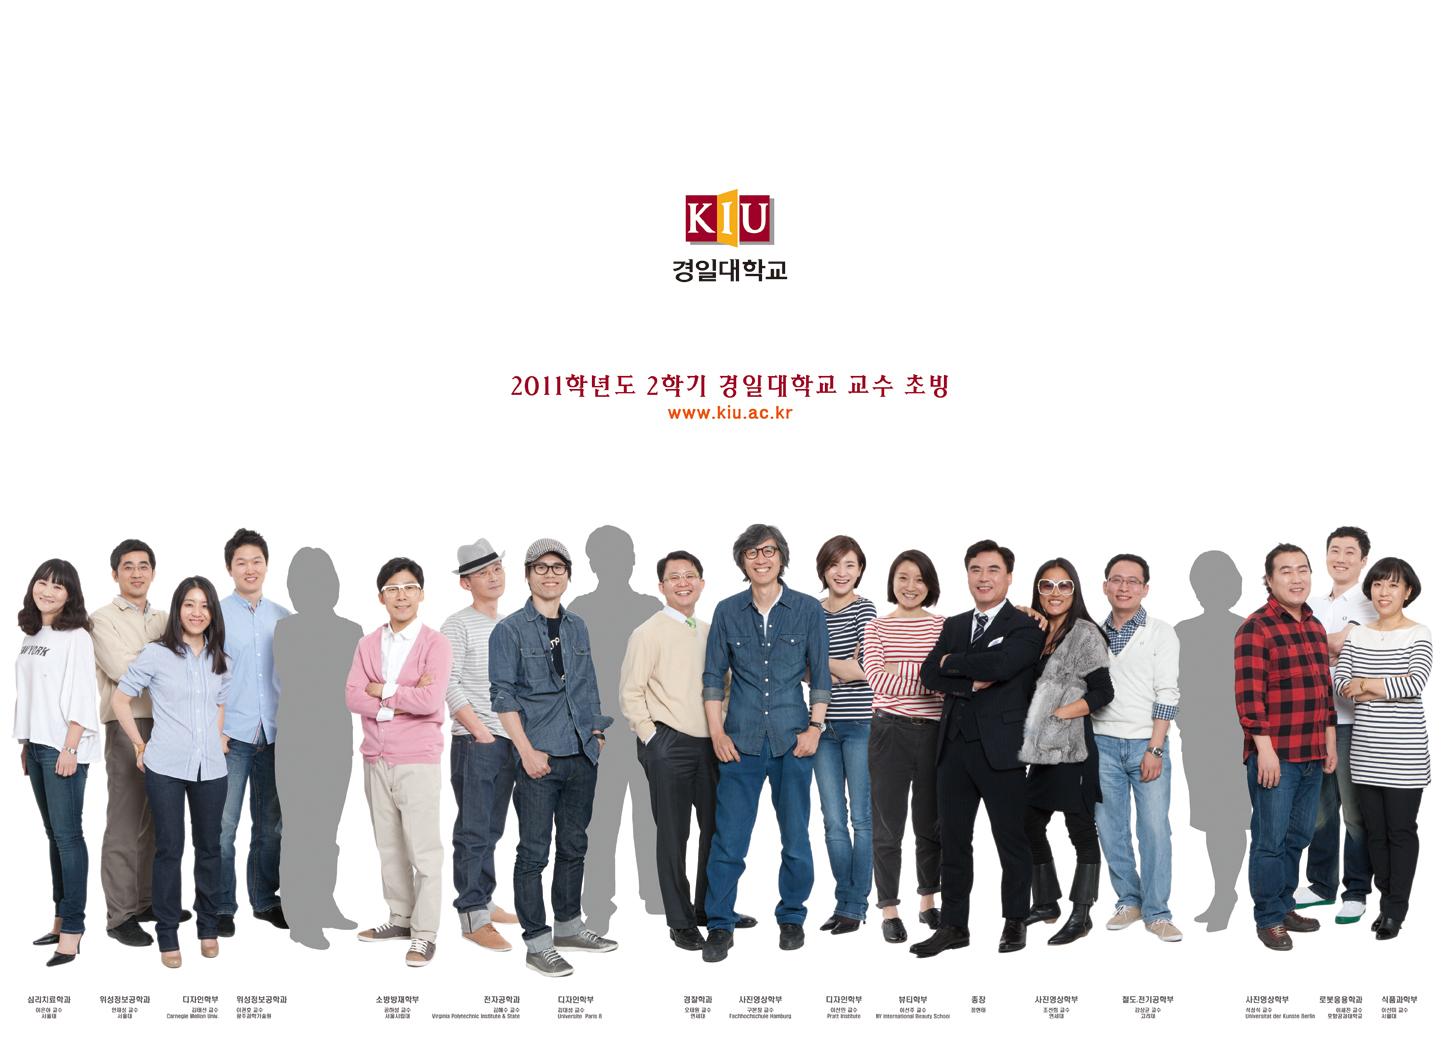 KIU 경일대학교 2011학년도 2학기 경일대학교 교수 초빙 www.kiu.ac.kr